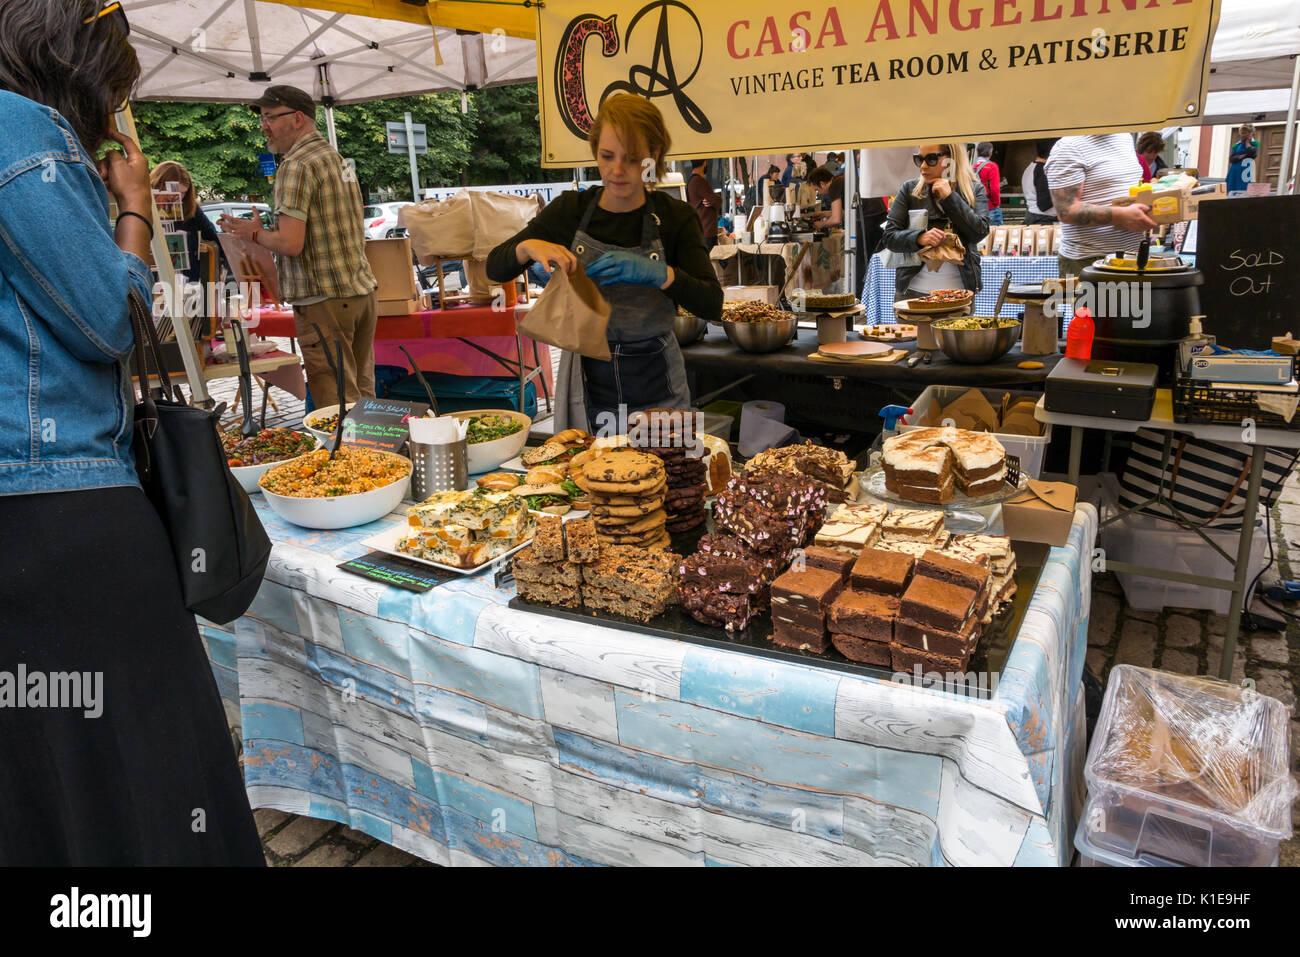 Dock Place, Leith, Edimburgo, Escocia, Reino Unido. Leith Sábado Farmers Market con la mujer comprar tortas en Casa Angelina Vintage Confitería Pastelería cale Imagen De Stock